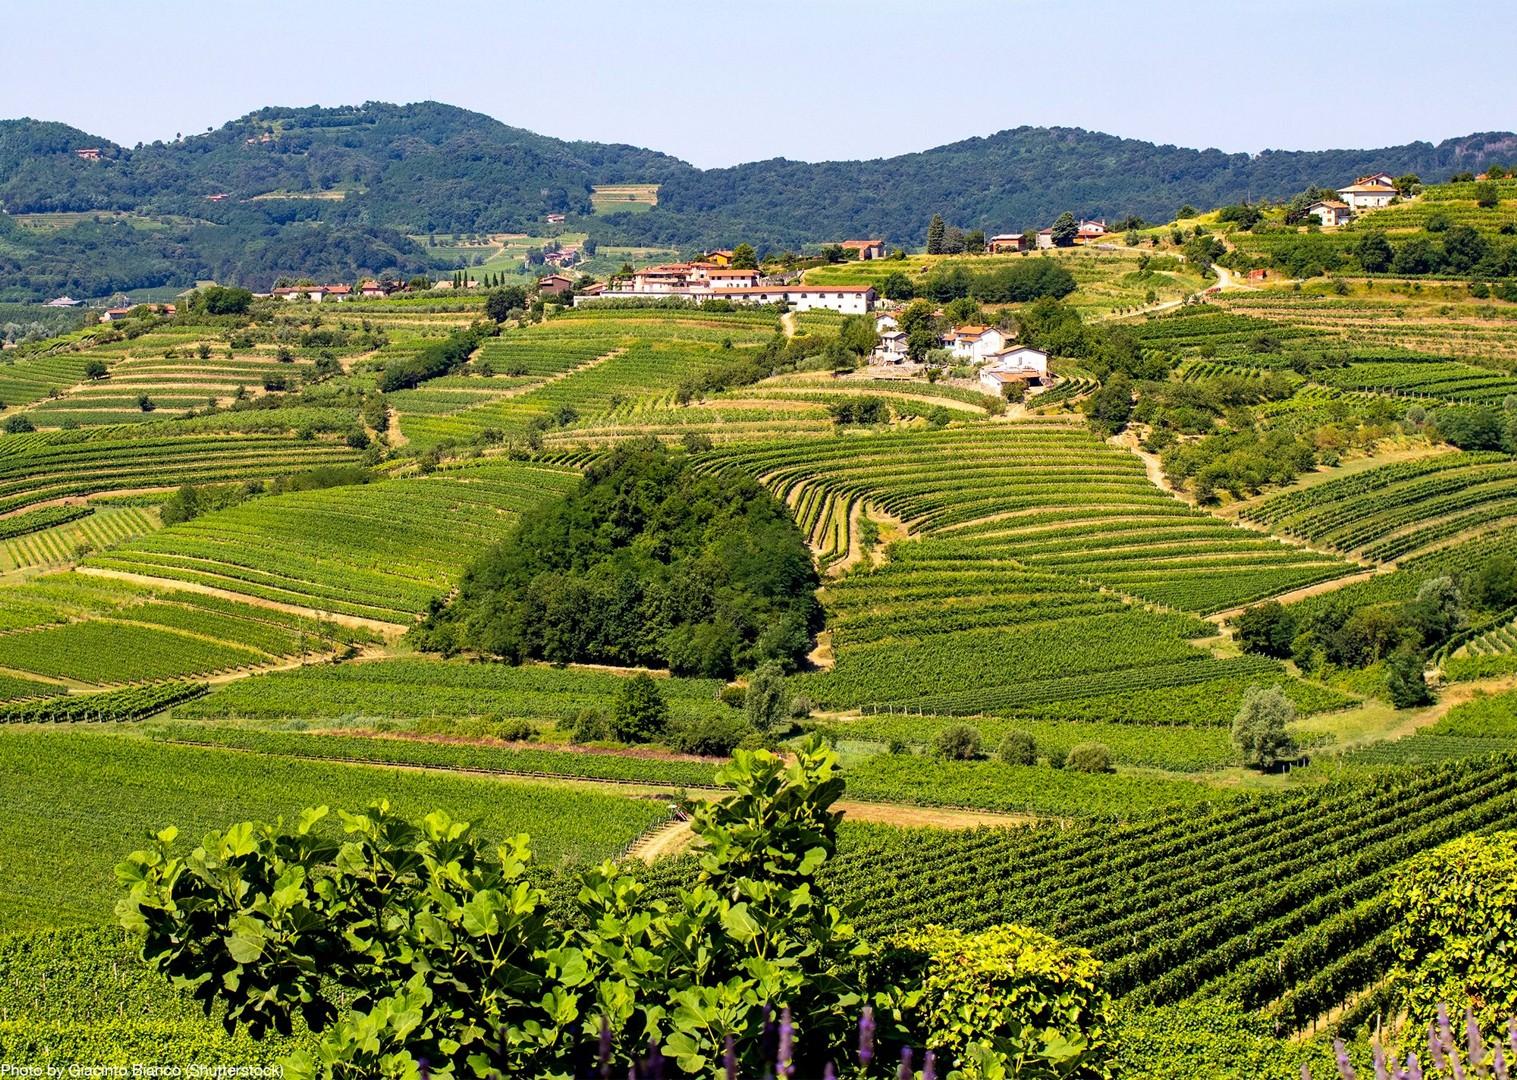 slovenia-and-croatia-tour-guided-road-cycling-holiday-skedaddle.jpg - Slovenia & Croatia - Julian Alps & Istria - Guided Road Cycling Holiday - Road Cycling